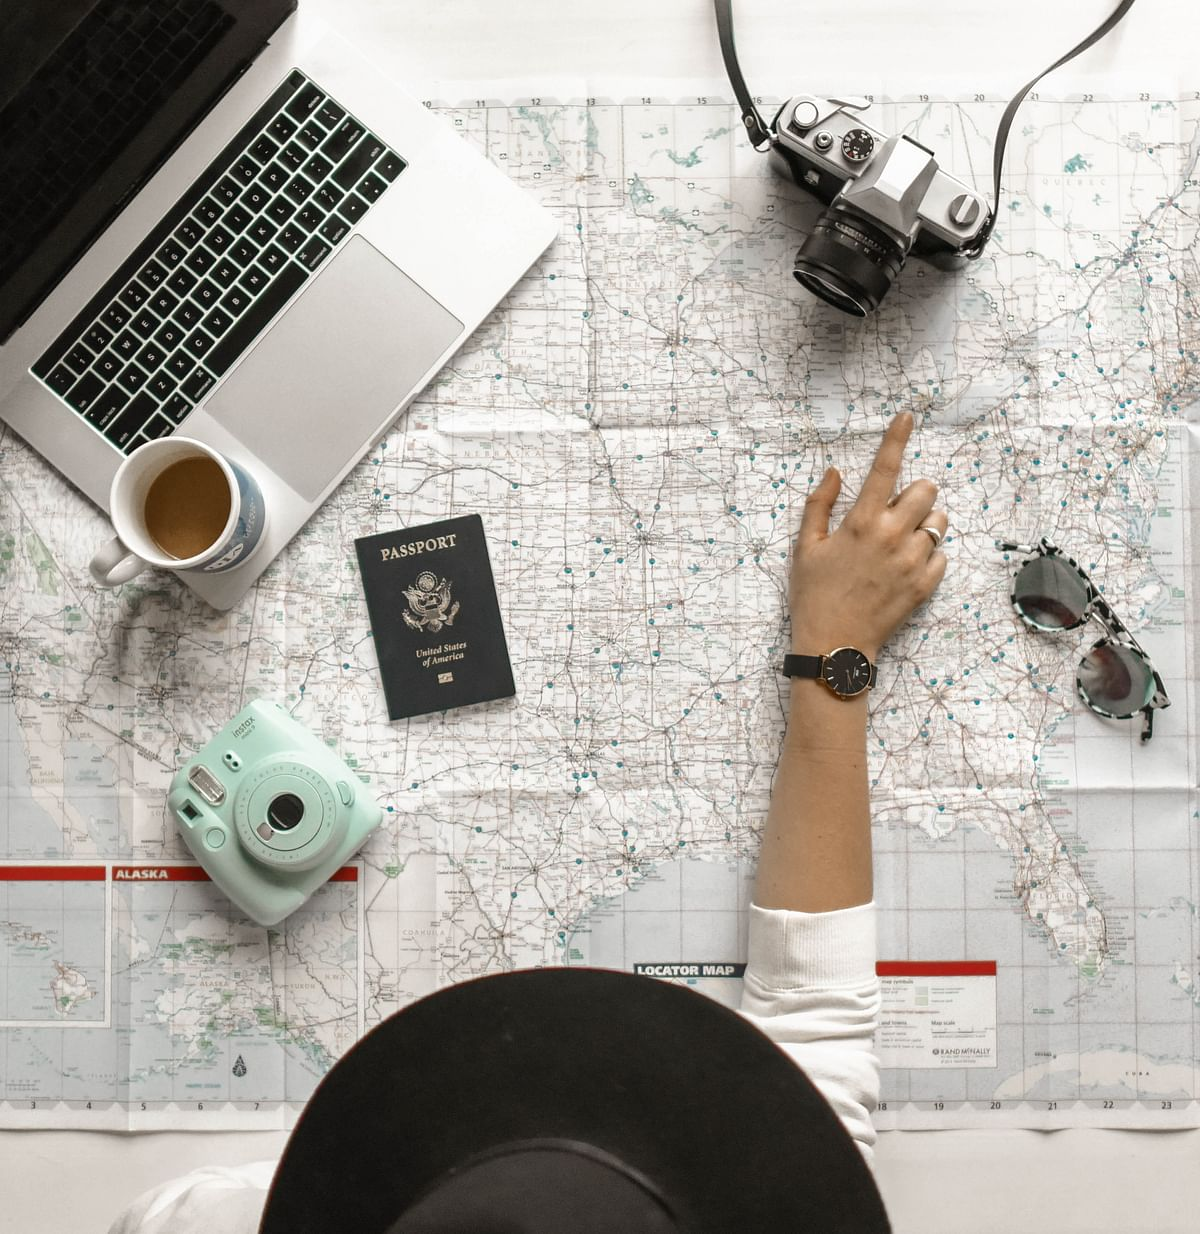 Thomas Cook India survey says 89% people keen to 'resume travel'